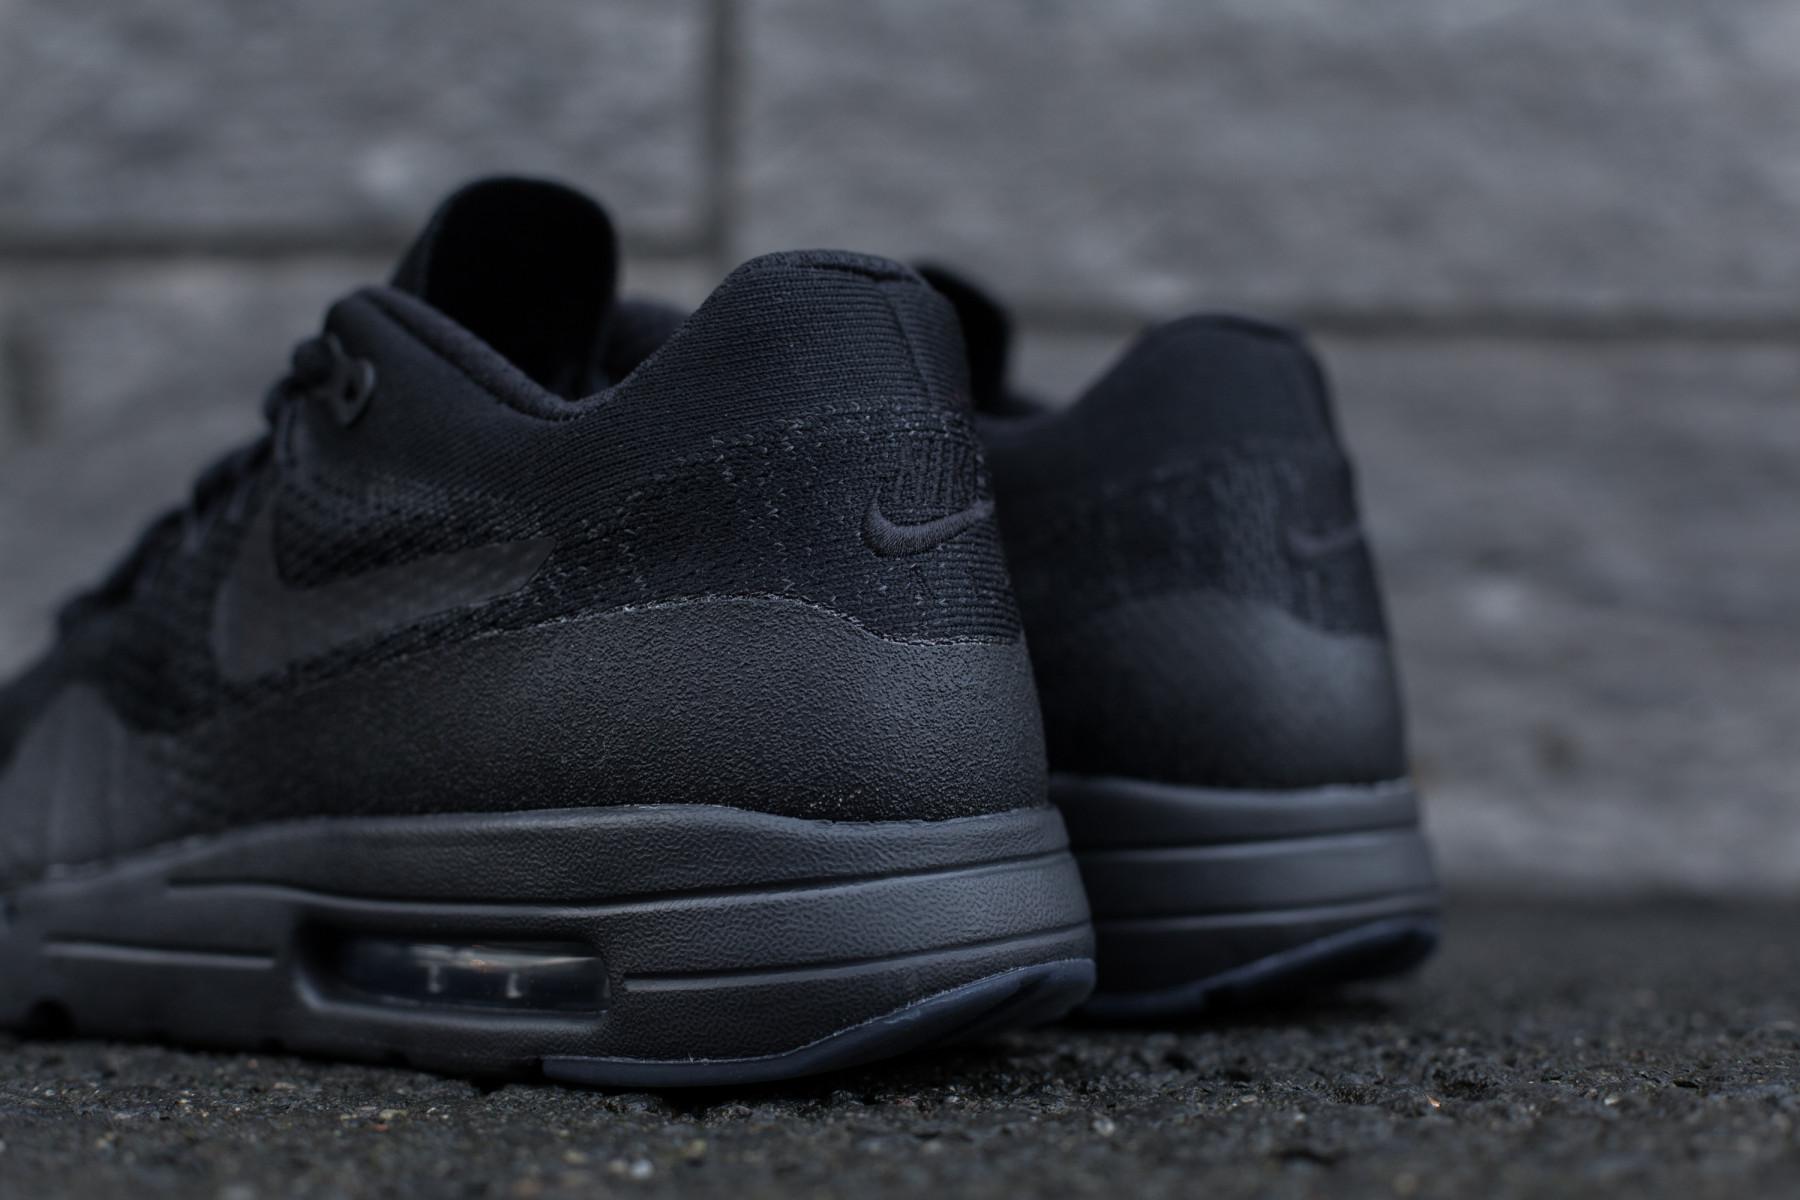 Nike Air Max 1 Ultra Flyknit Sneaker.no